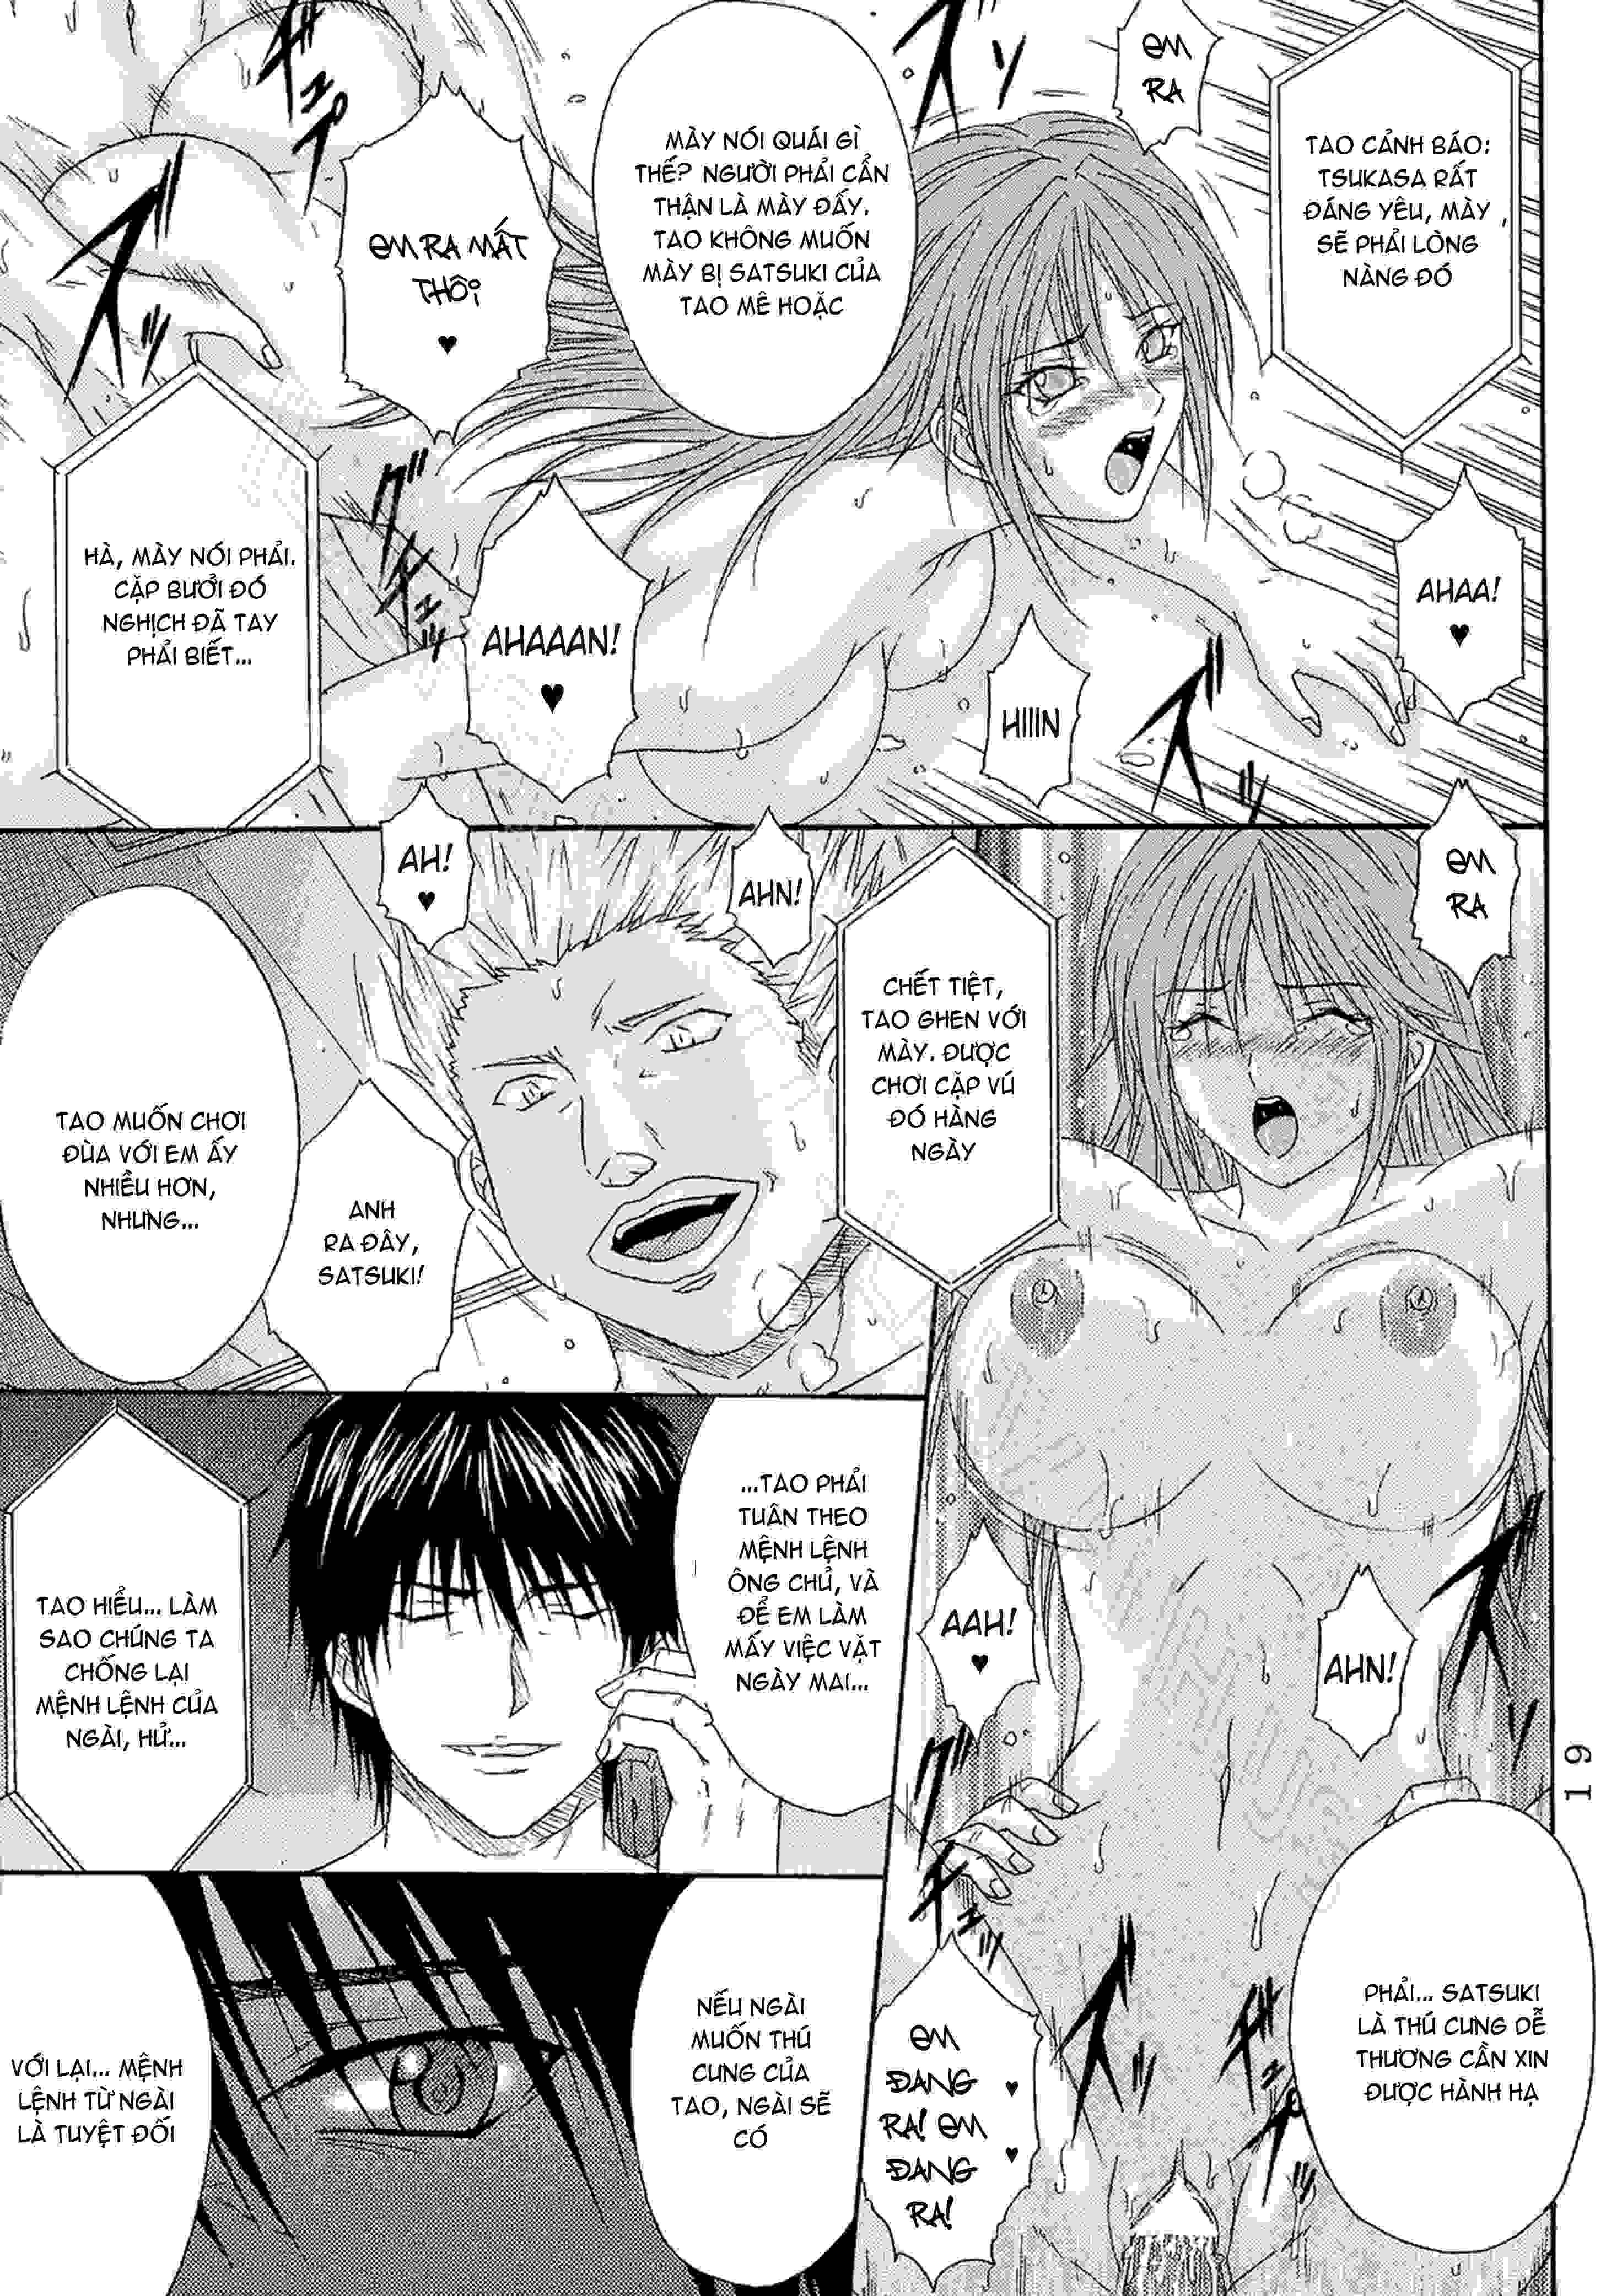 TruyenHay.Com - Ảnh 18 - Ryoujoku Rensa Chapter 6